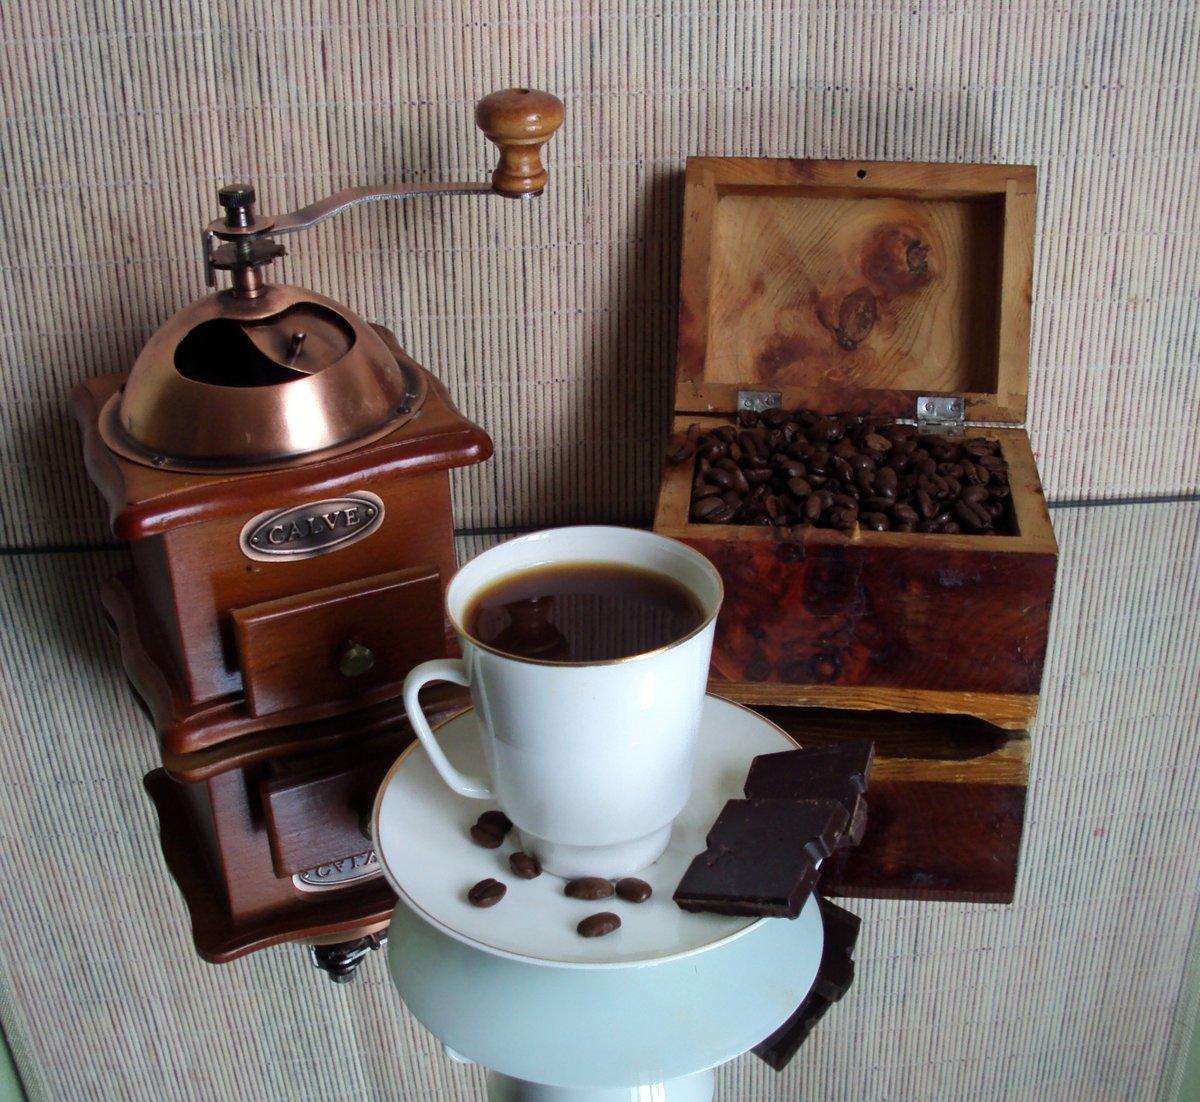 нежелательная картинки кофе и кофемолка фарватер, линкор бросил